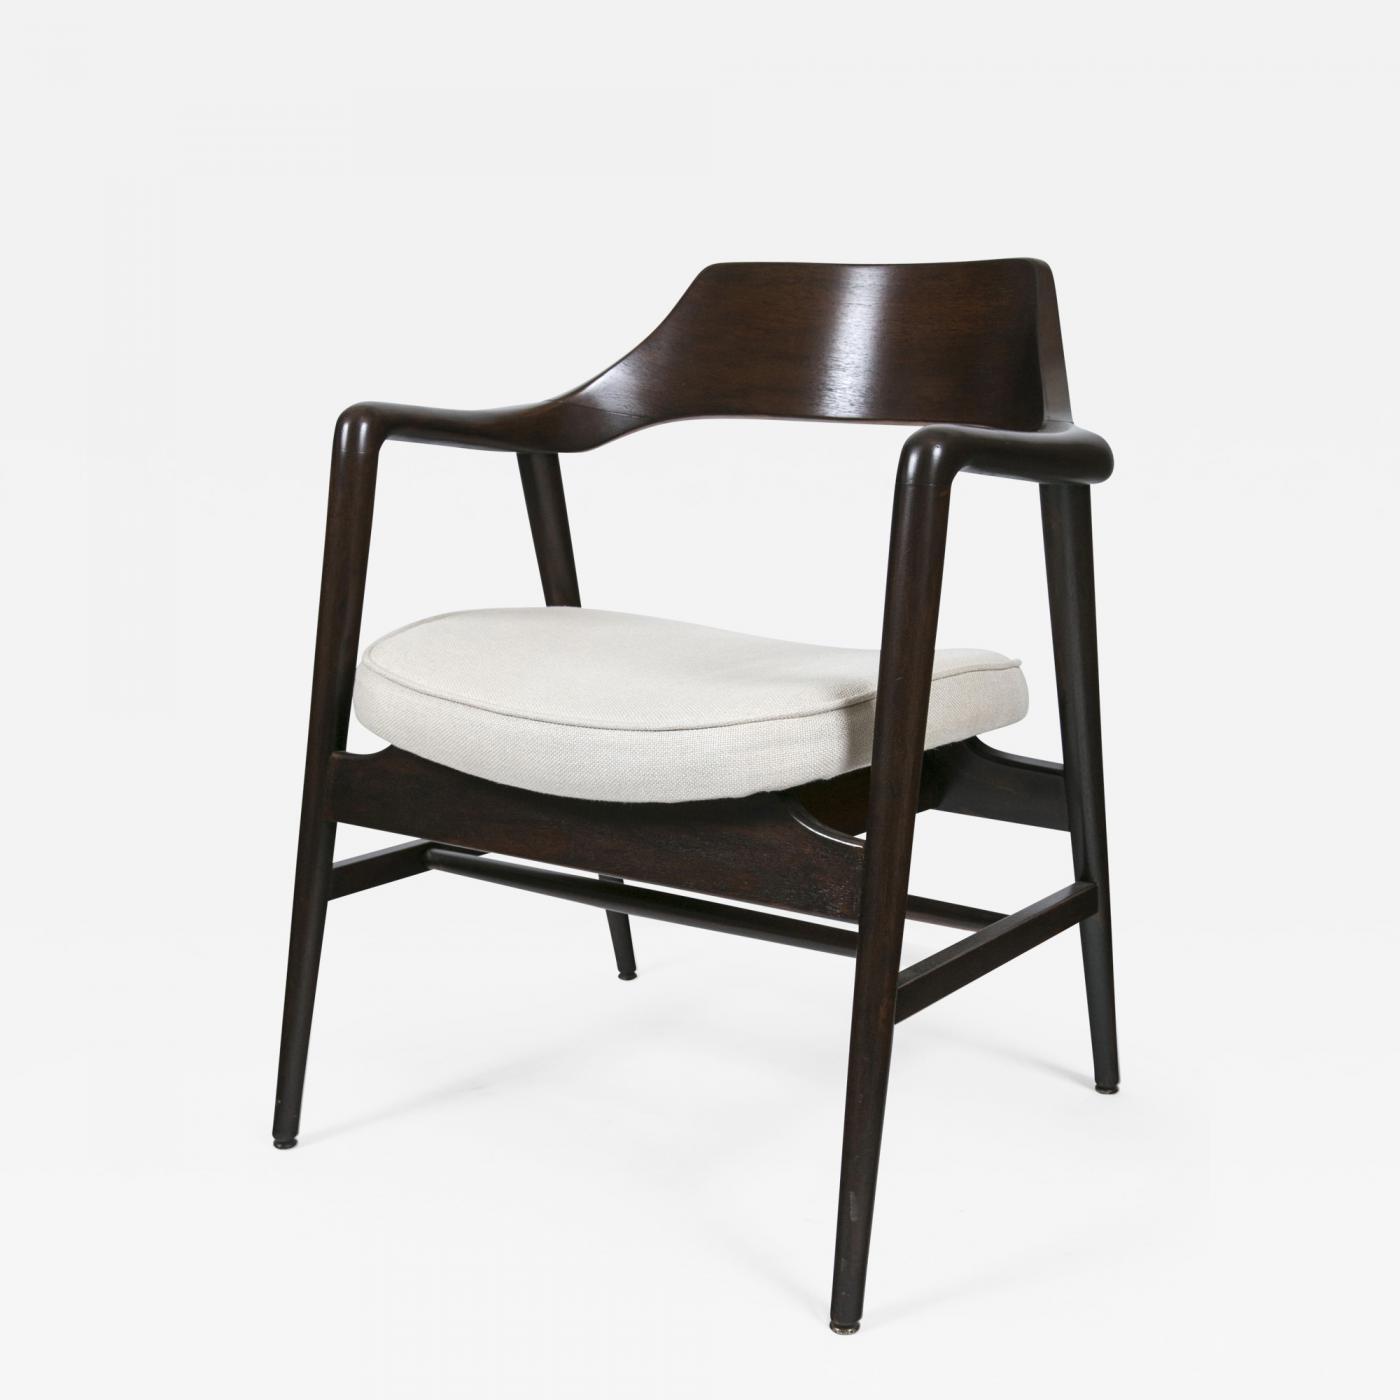 wh gunlocke chair artifort orange slice w h co wood framed arm